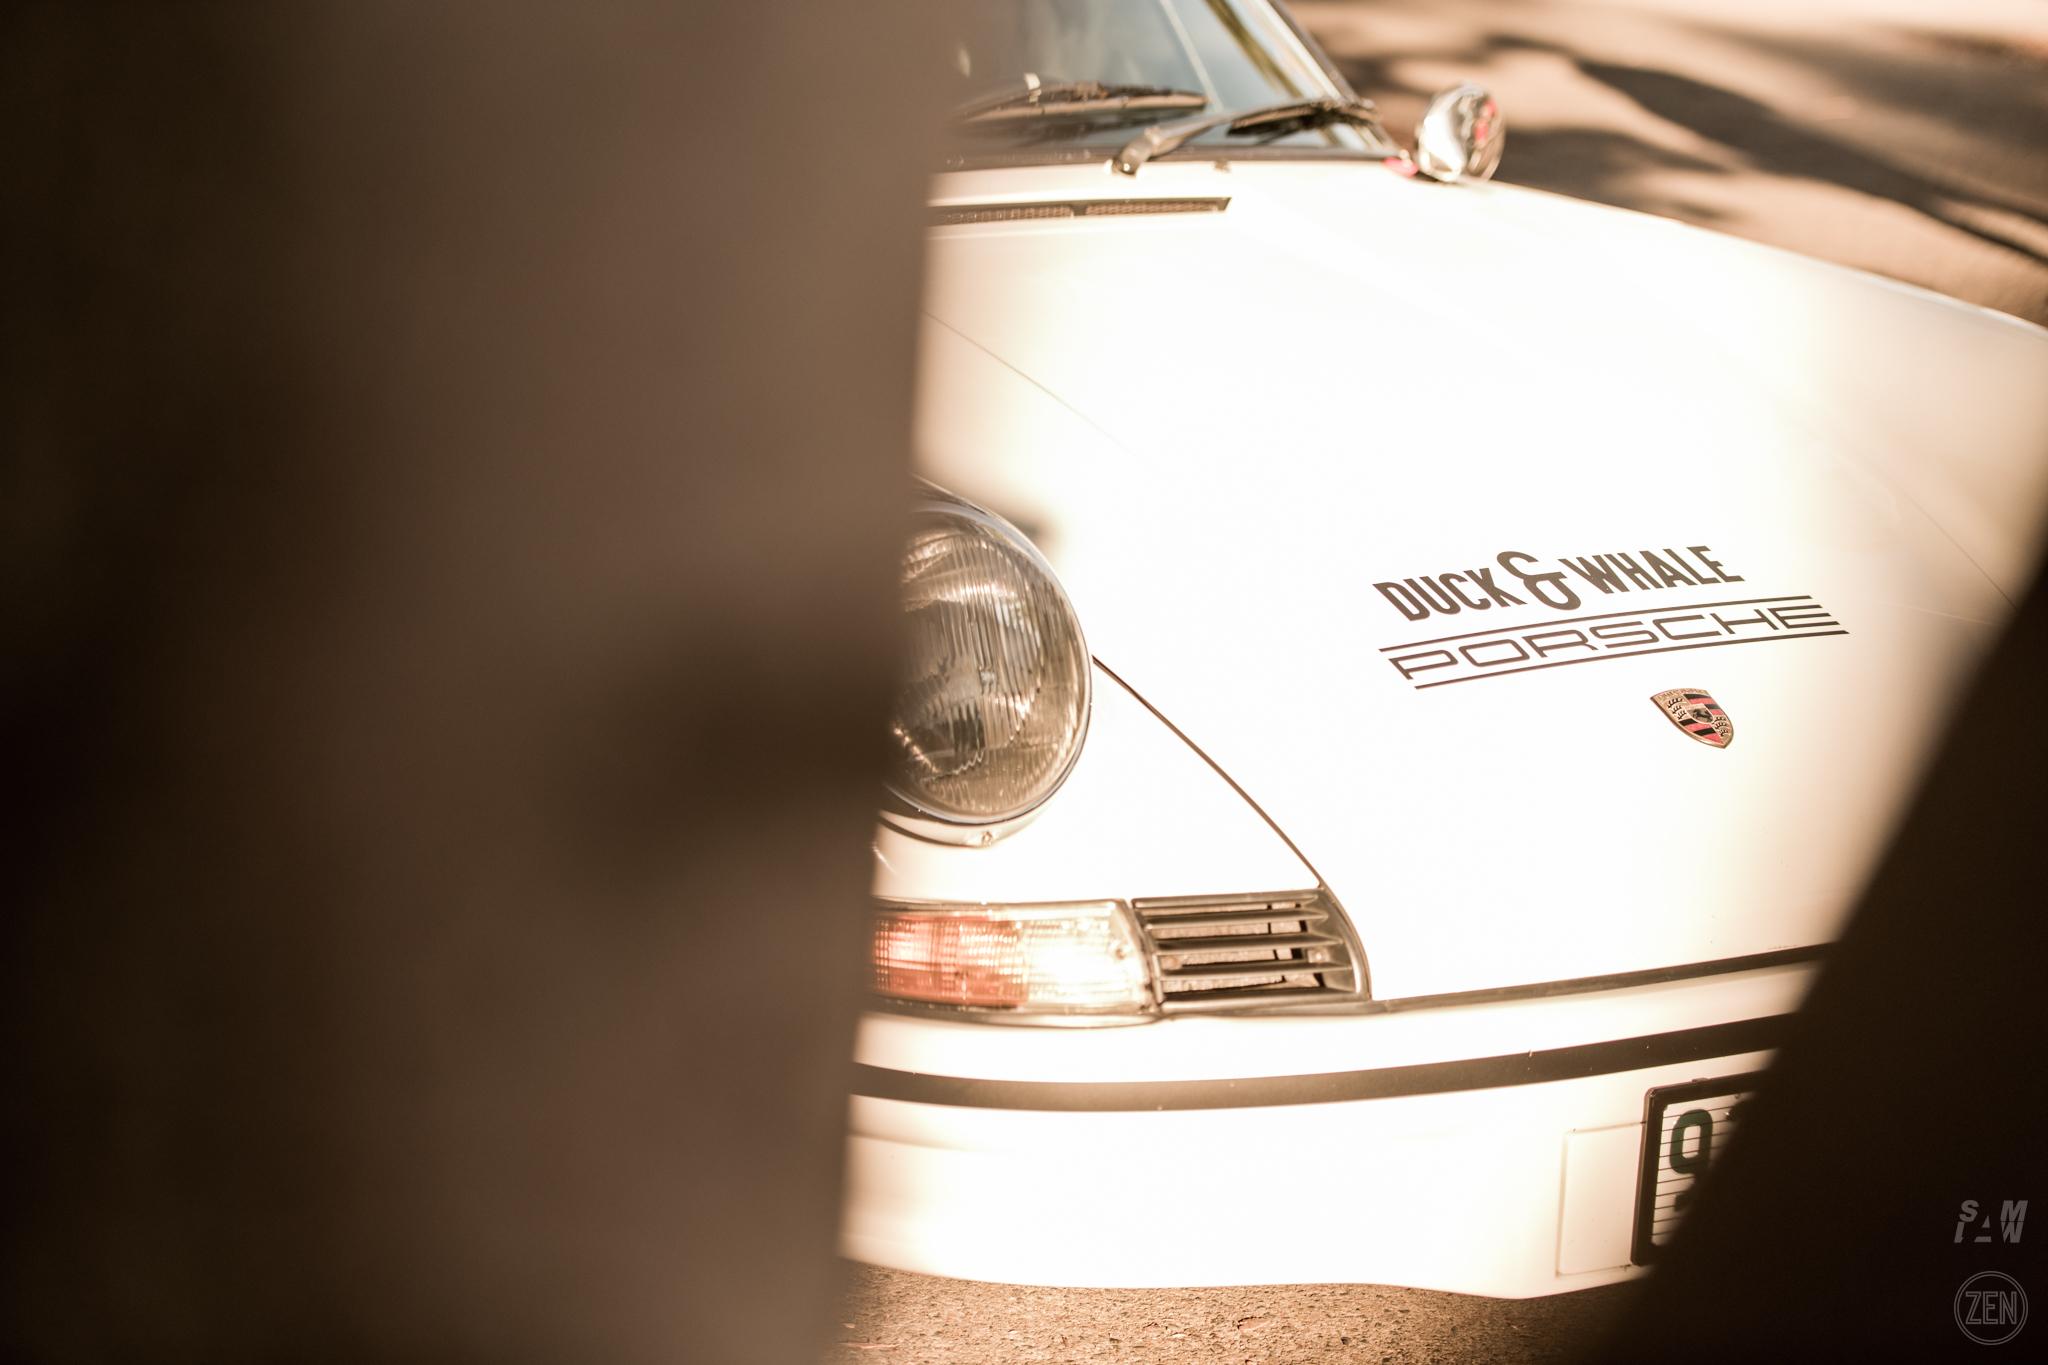 2019-10-27 - Autohaus Porsches & Coffee 059